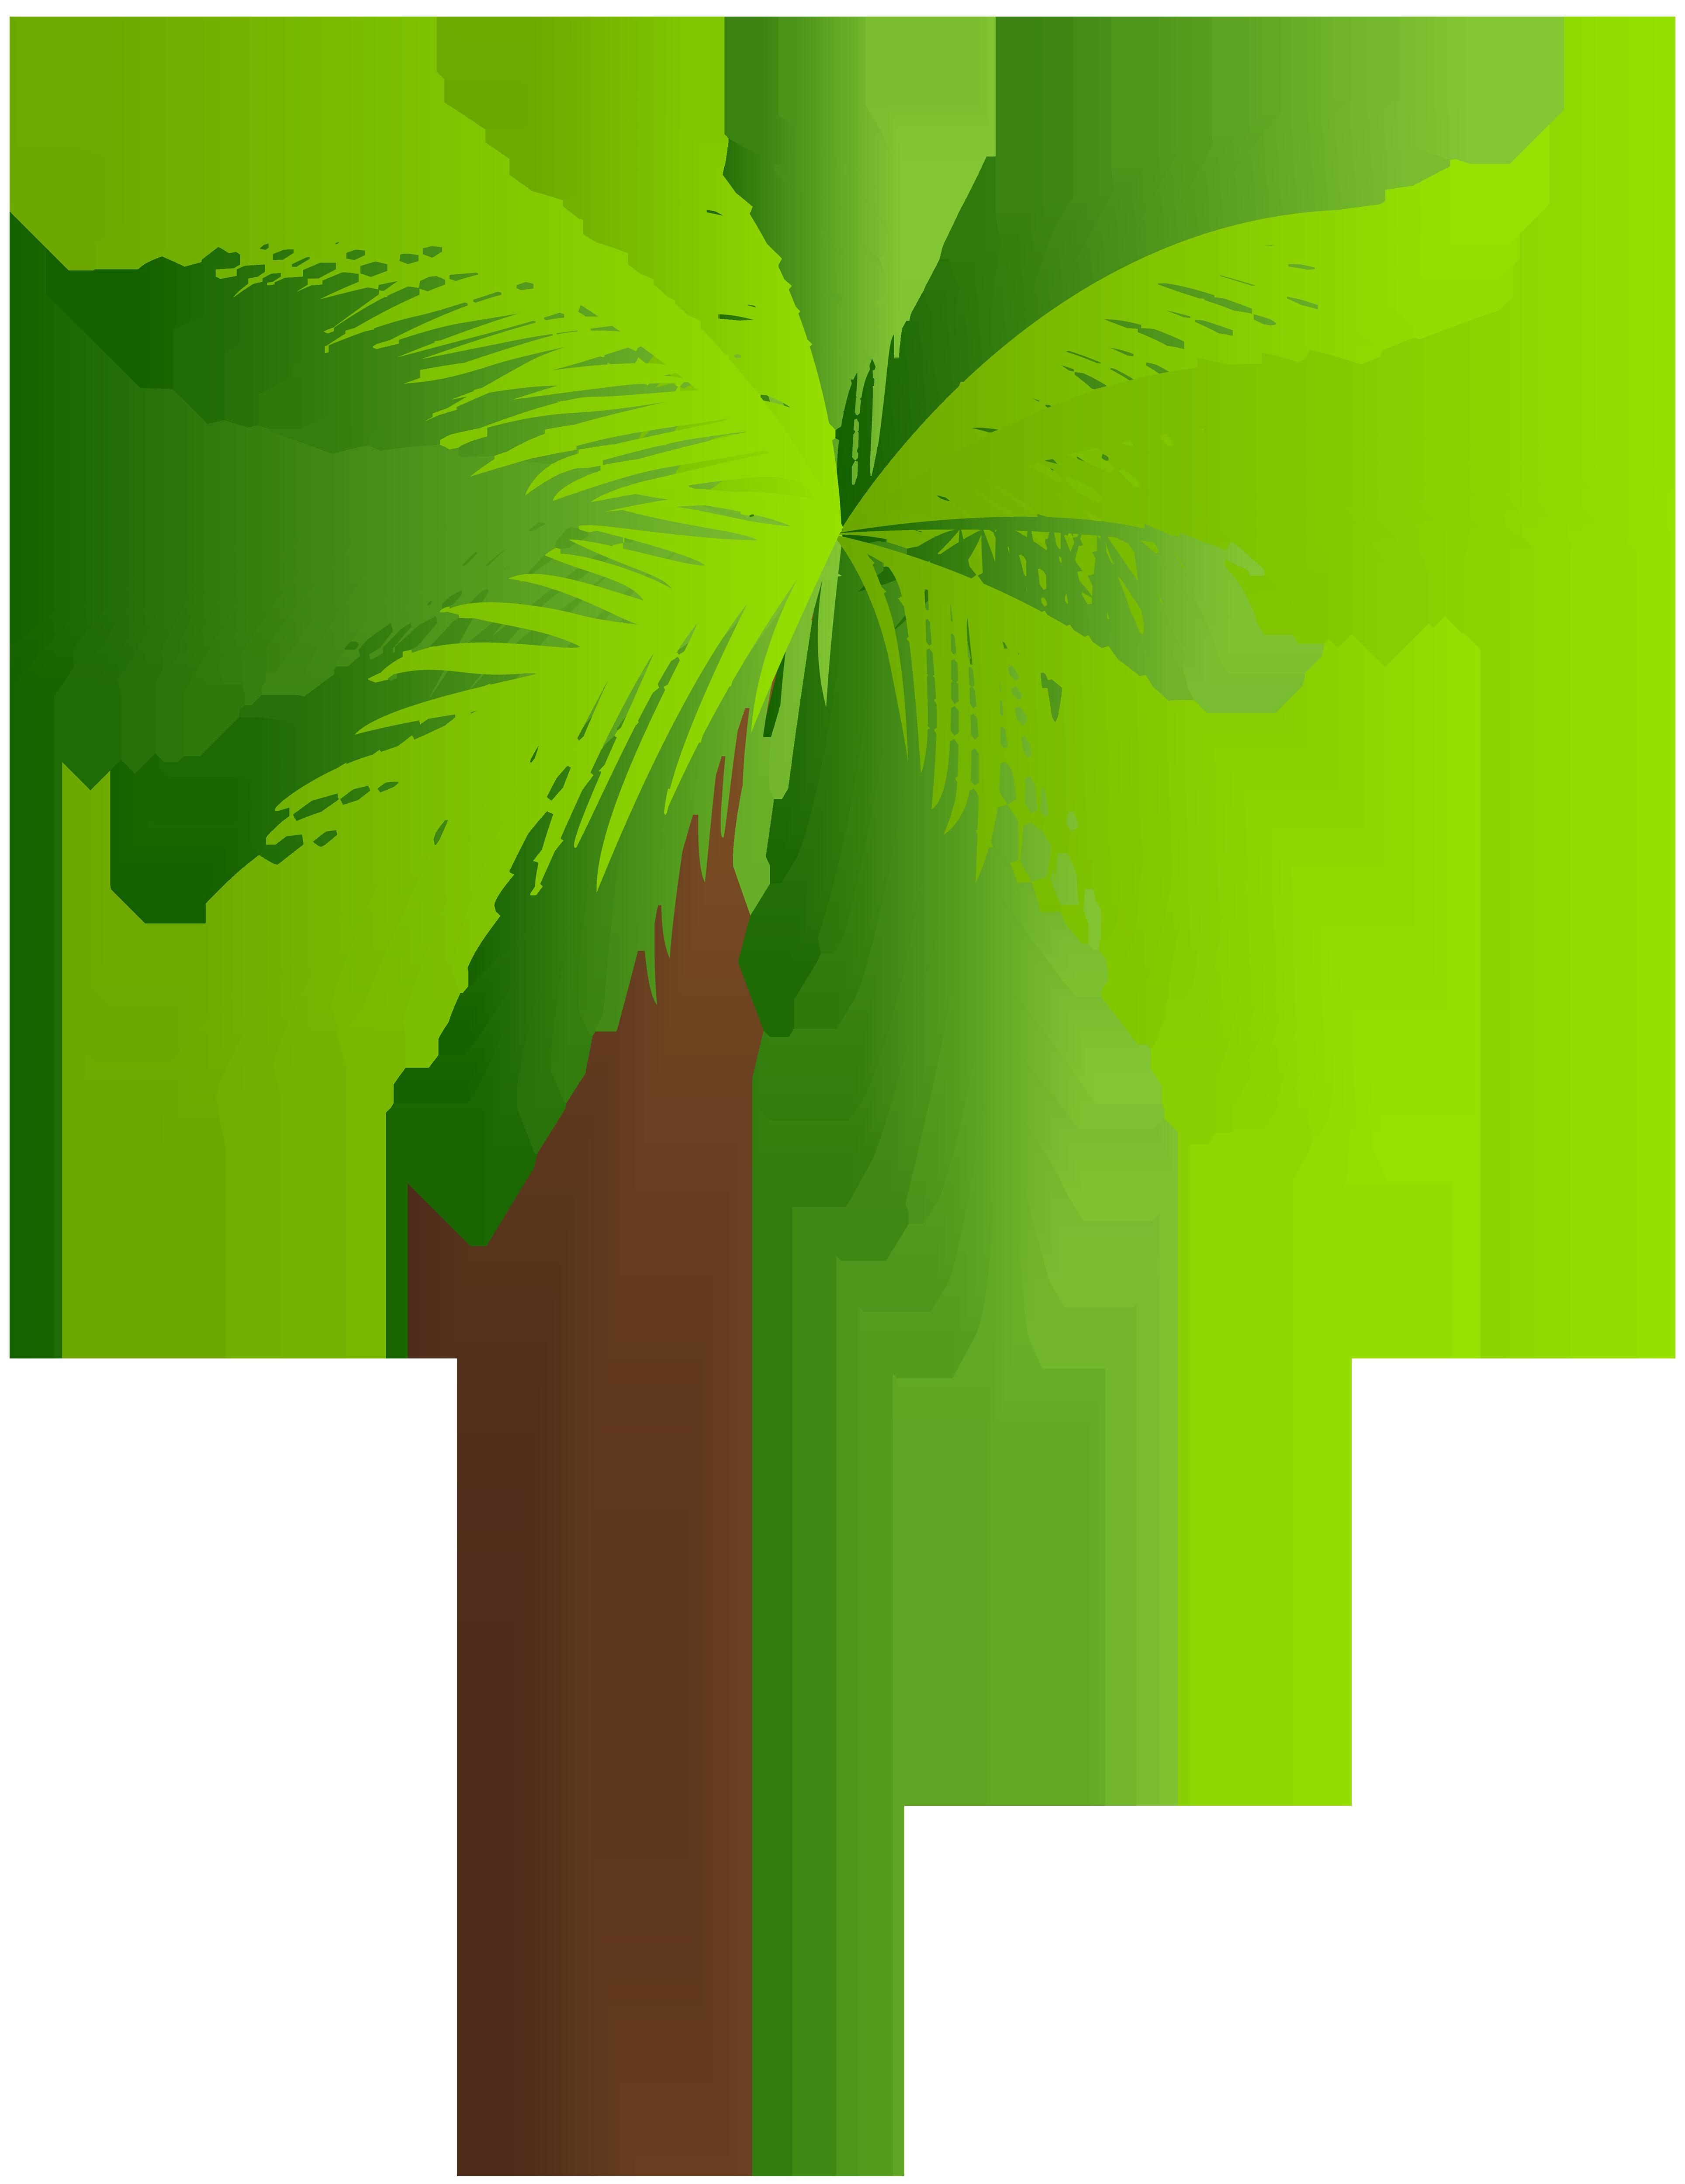 svg stock Png clip art image. Palm clipart.